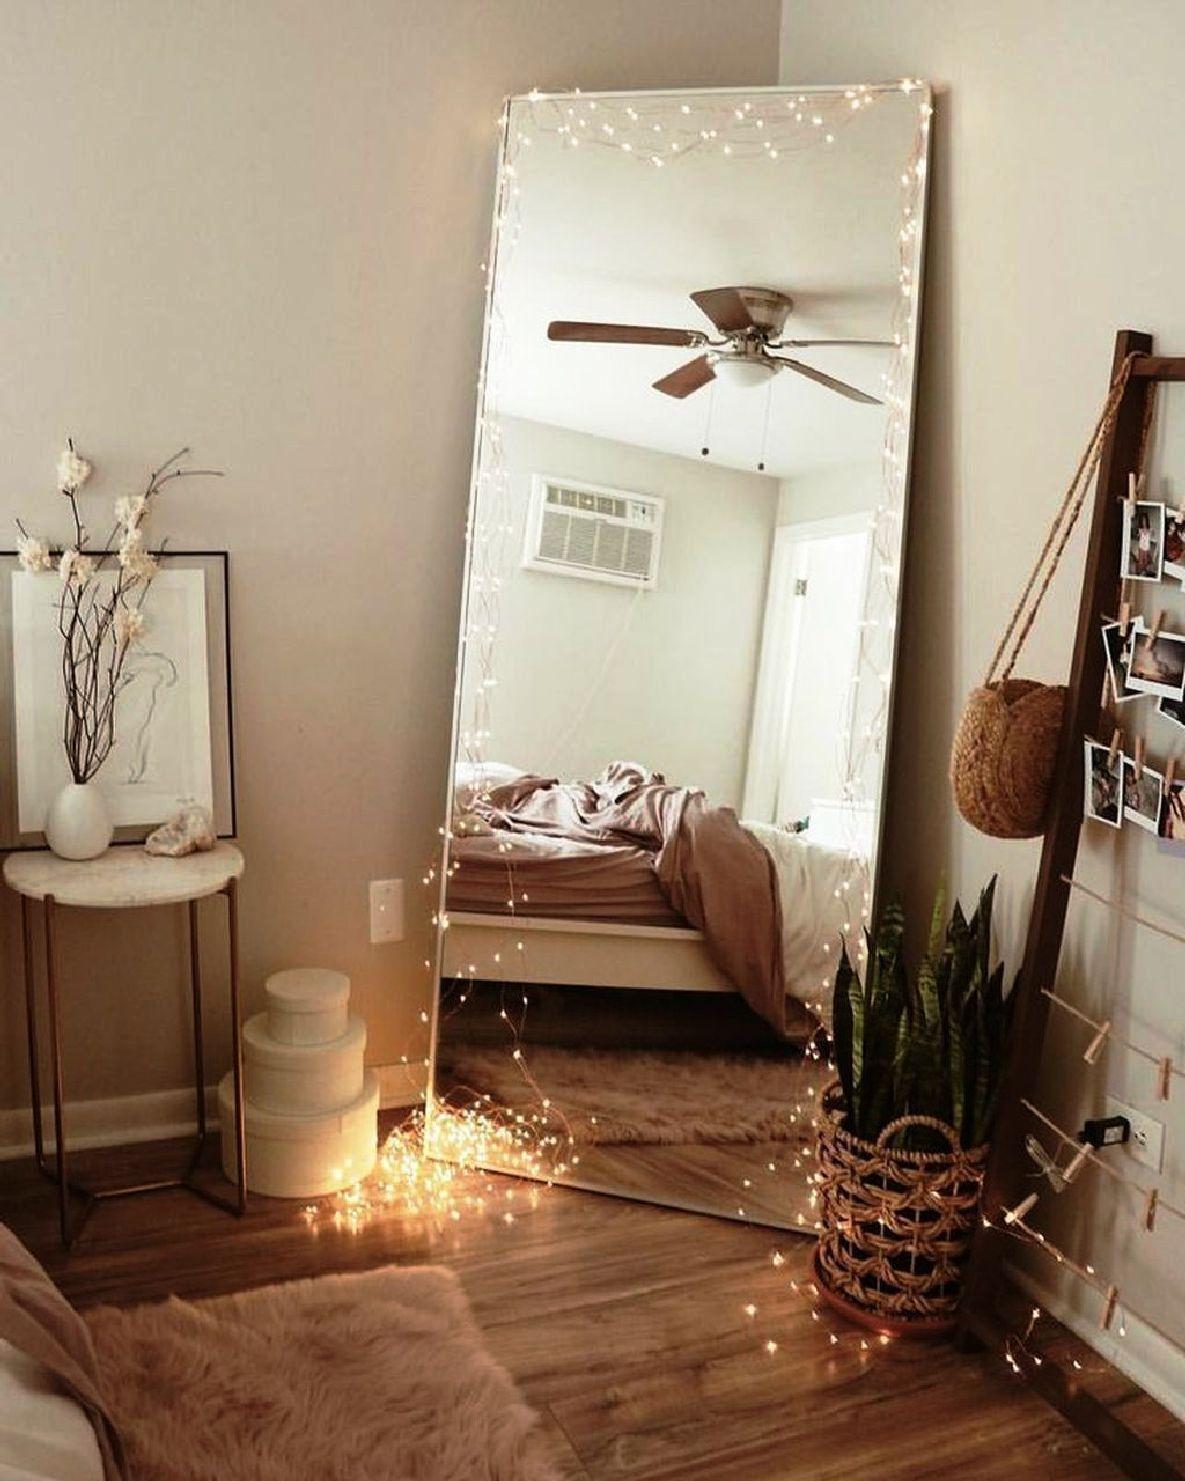 35 Popular Lighting Design For Decorating Your Bedroom Looks Beautiful Homezideas In 2020 Dorm Room Decor Room Ideas Bedroom Bedroom Decor